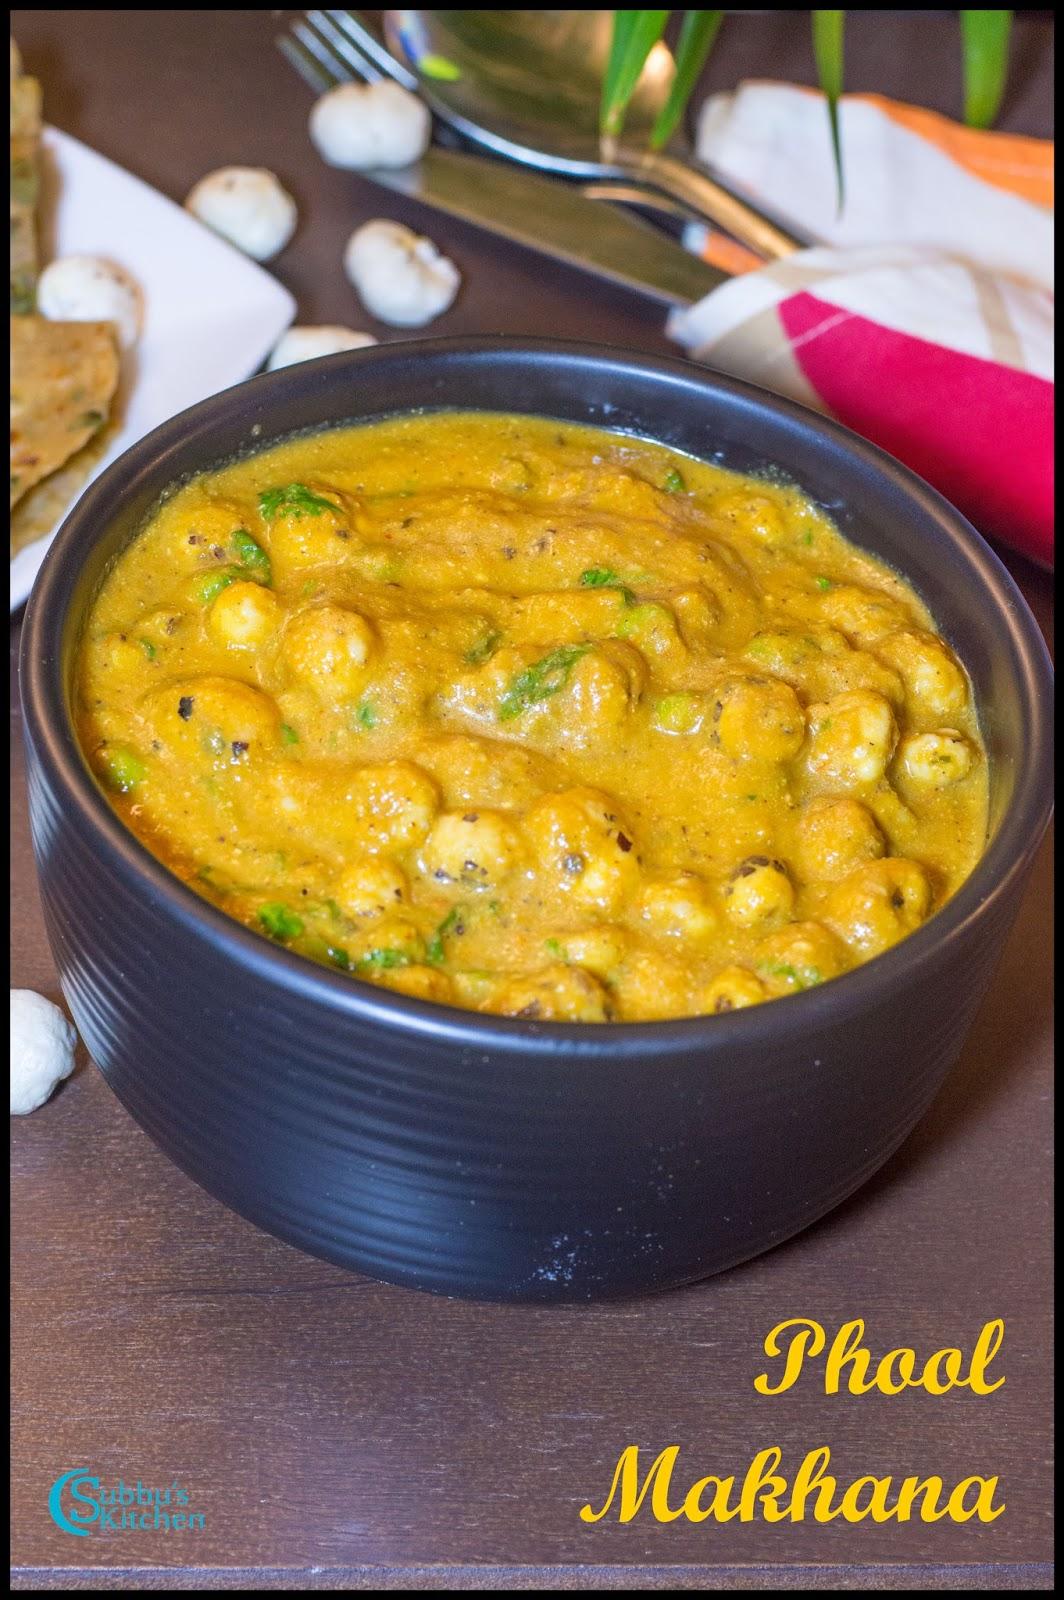 Phool Makhana Curry Recipe Lotus Seed Masala Recipe